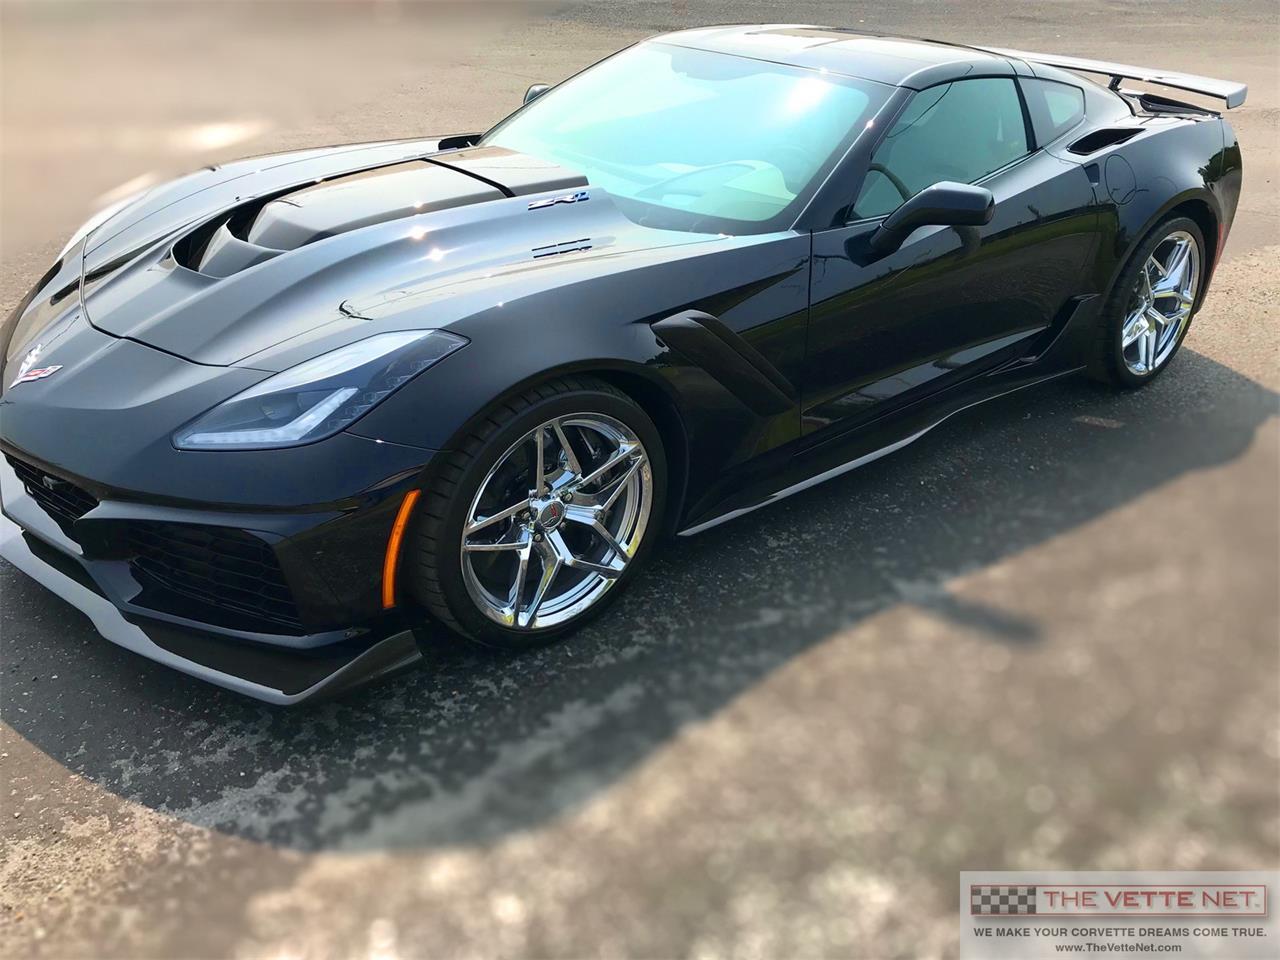 2019 Chevrolet Corvette (CC-1391697) for sale in Sarasota, Florida